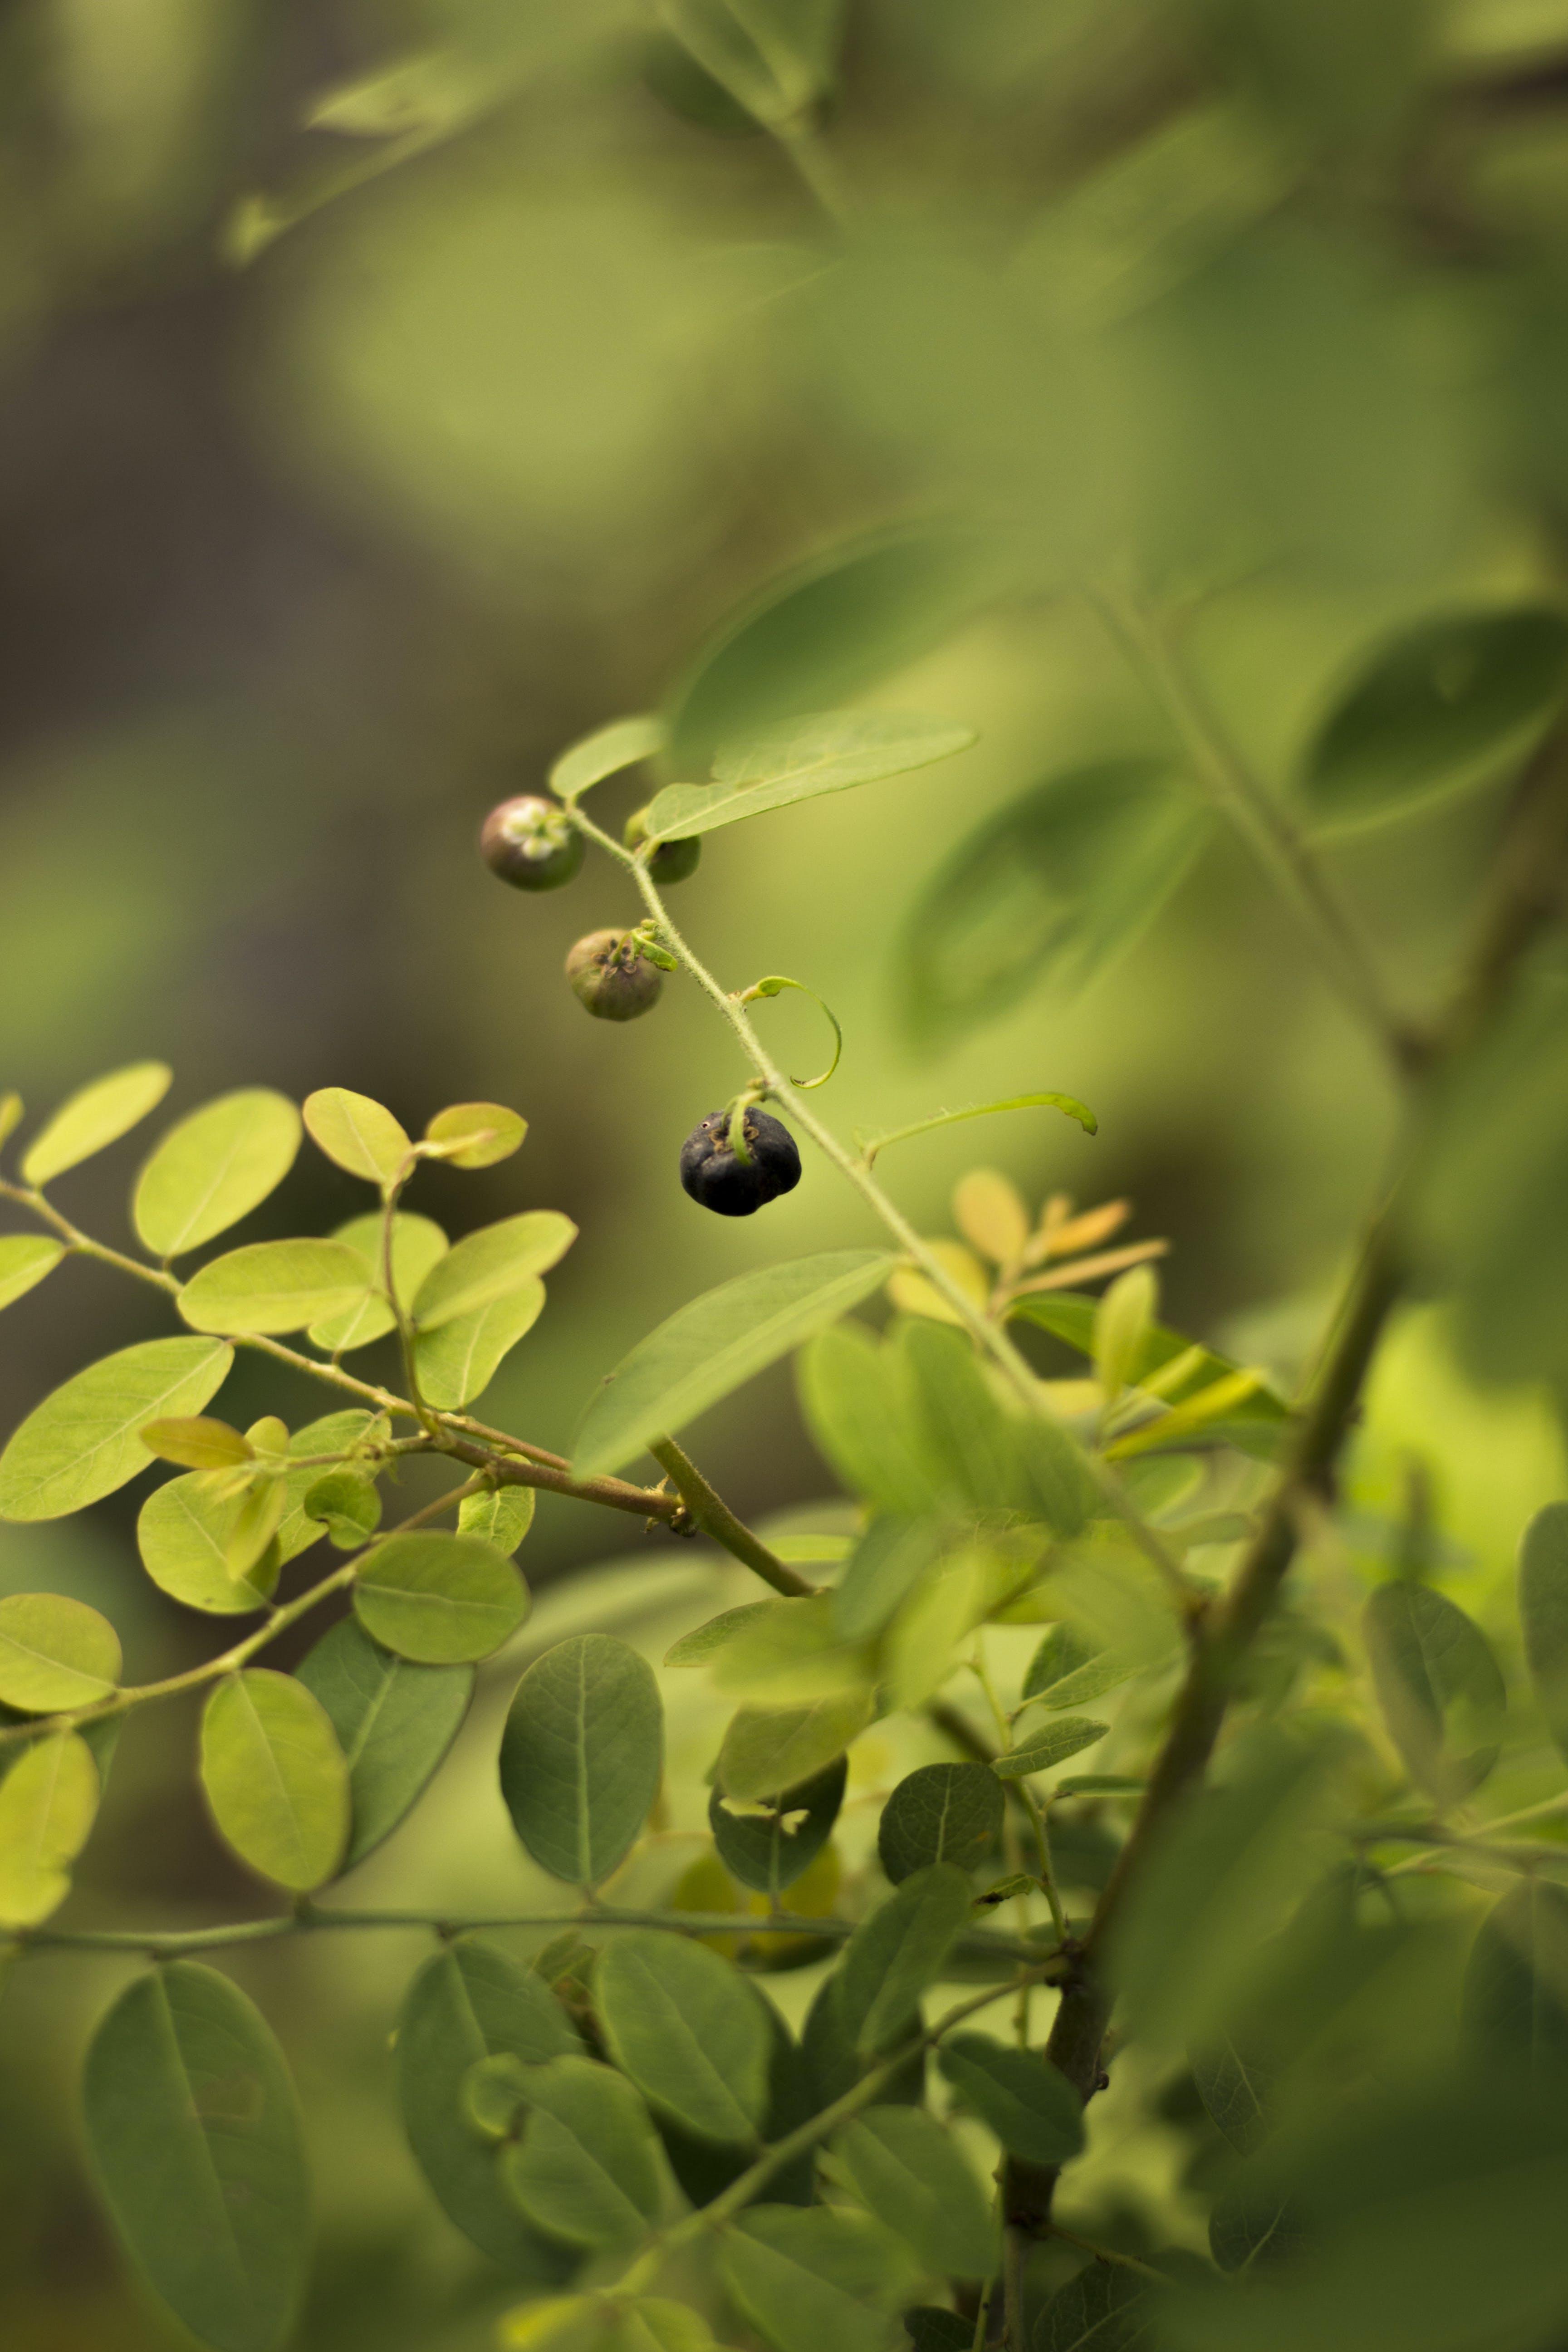 Free stock photo of berry, blackberry, green leaf, leaf